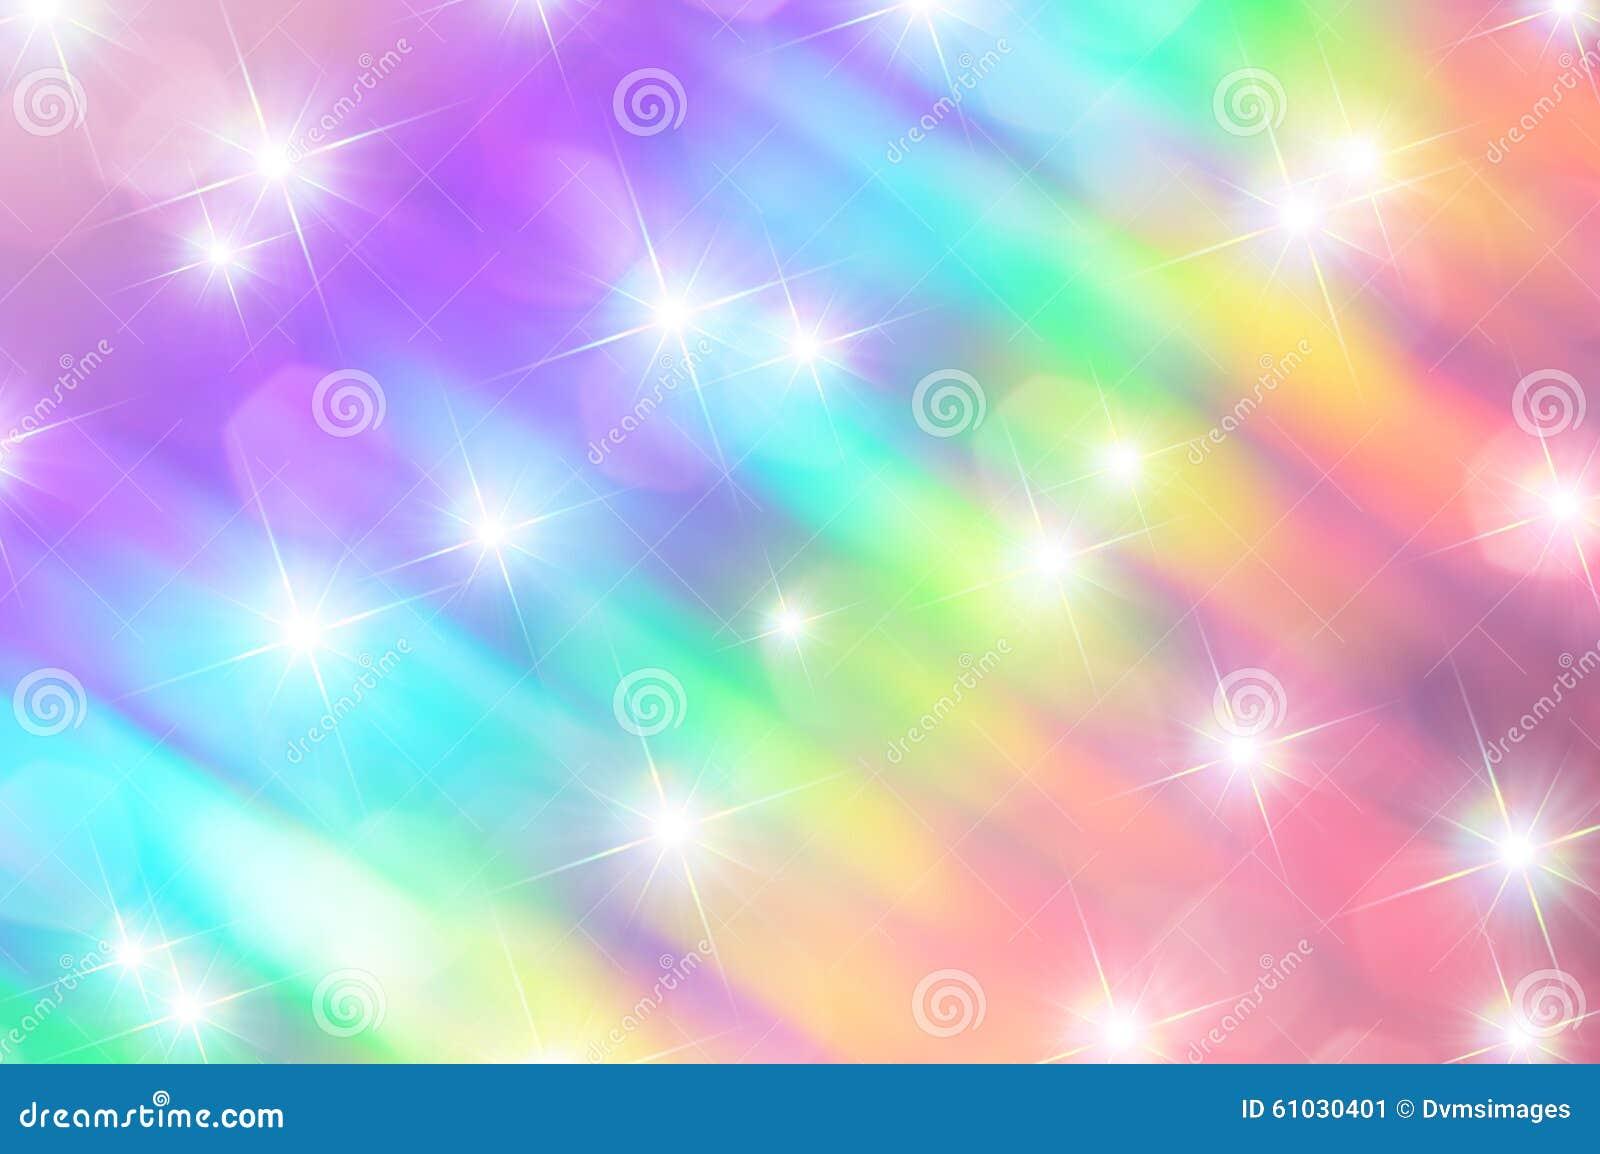 Rainbow Sparkle Stock Illustration - Image: 61030401